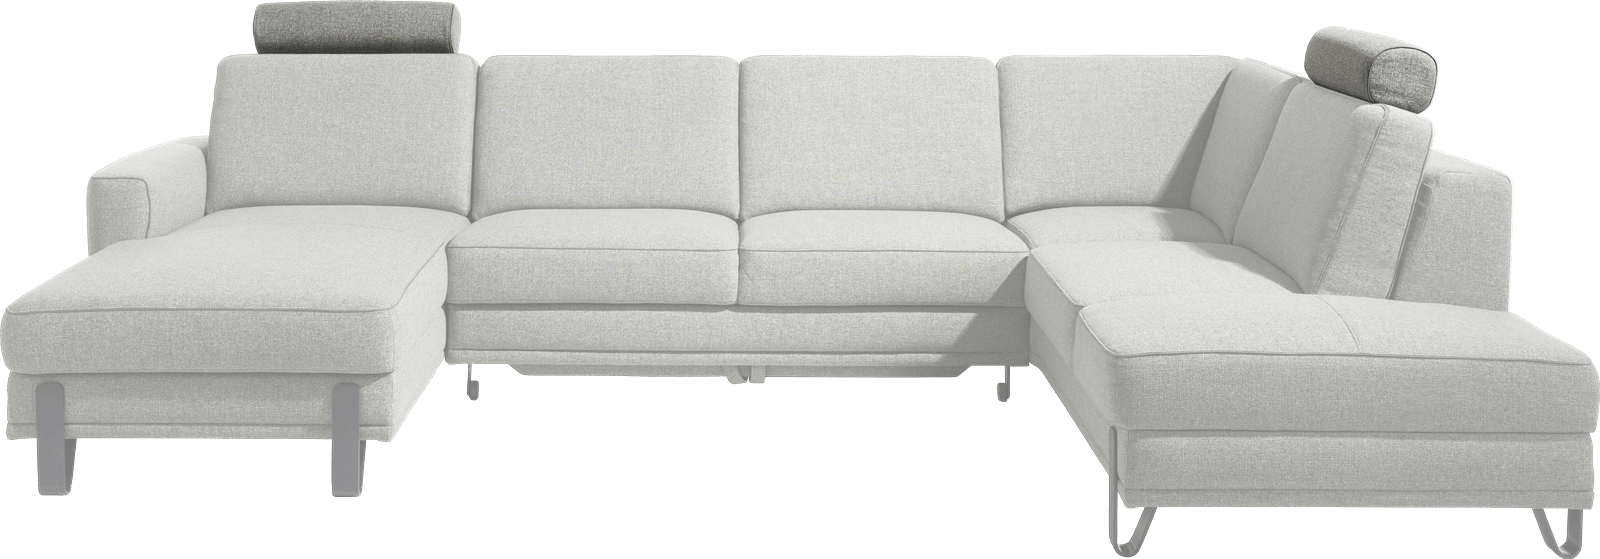 XOOON - Denver - Design minimaliste - Canapes - appui-tete